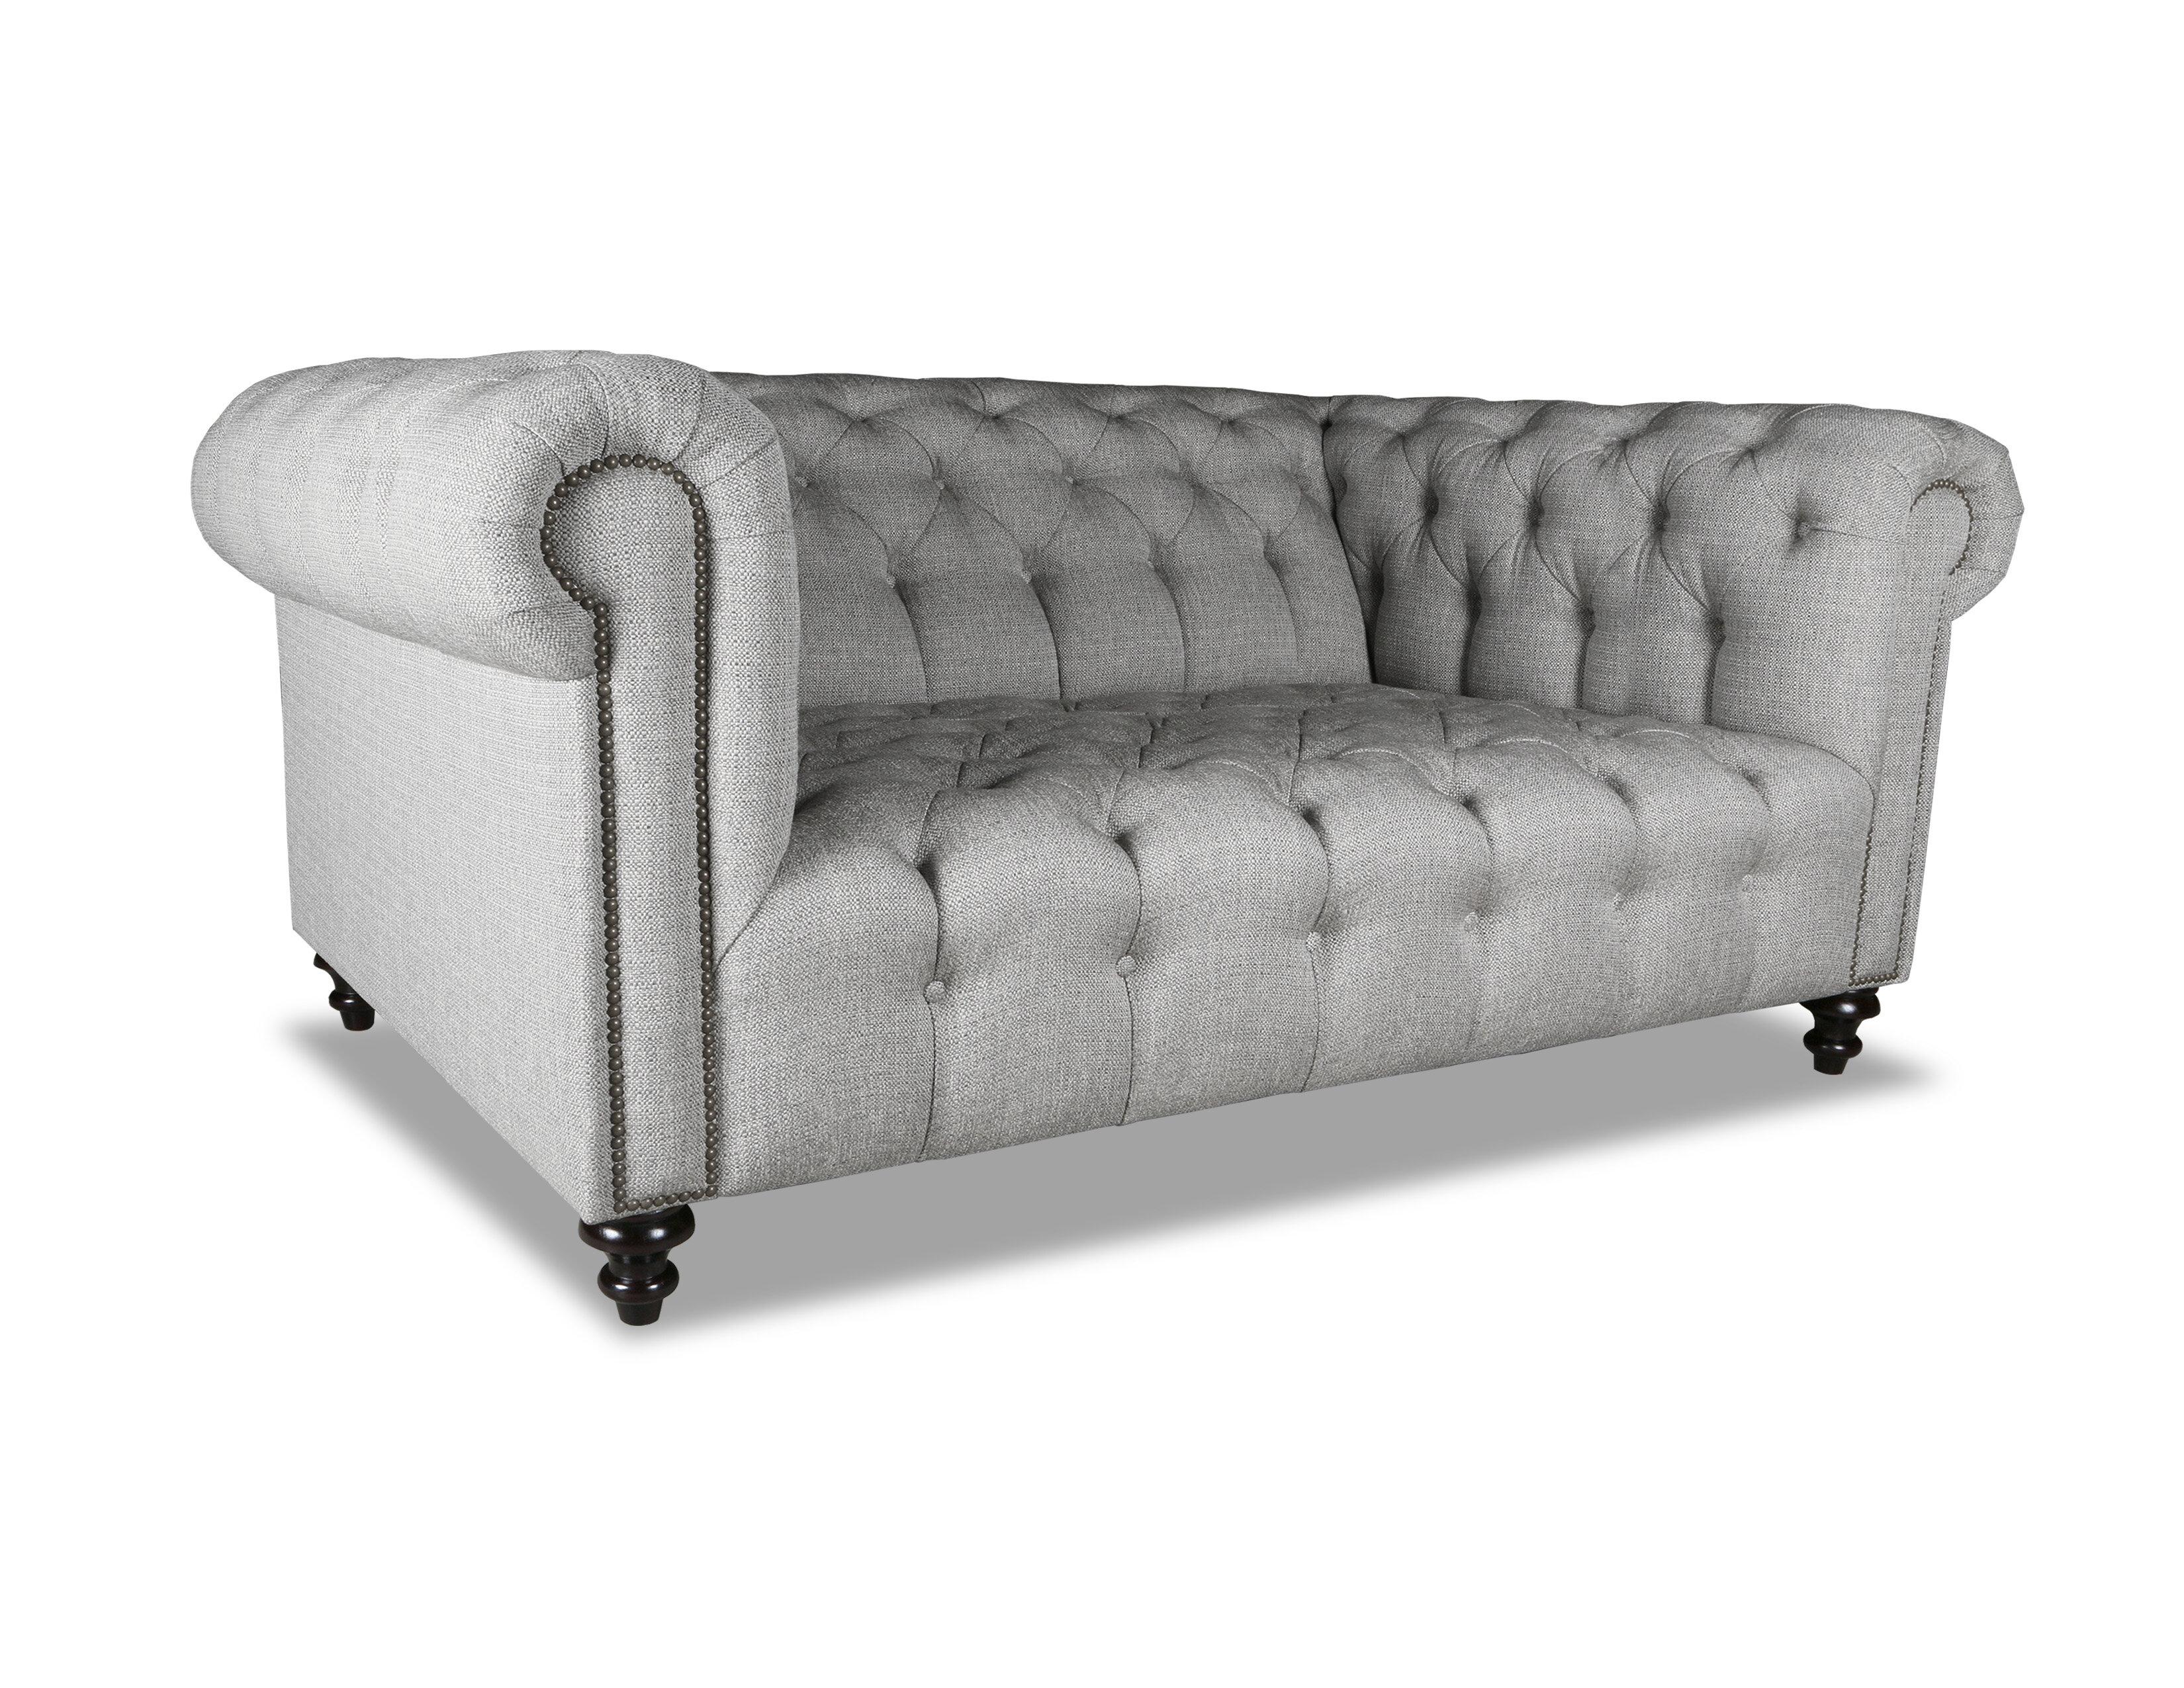 Estill Plush Deep Chesterfield Sofa